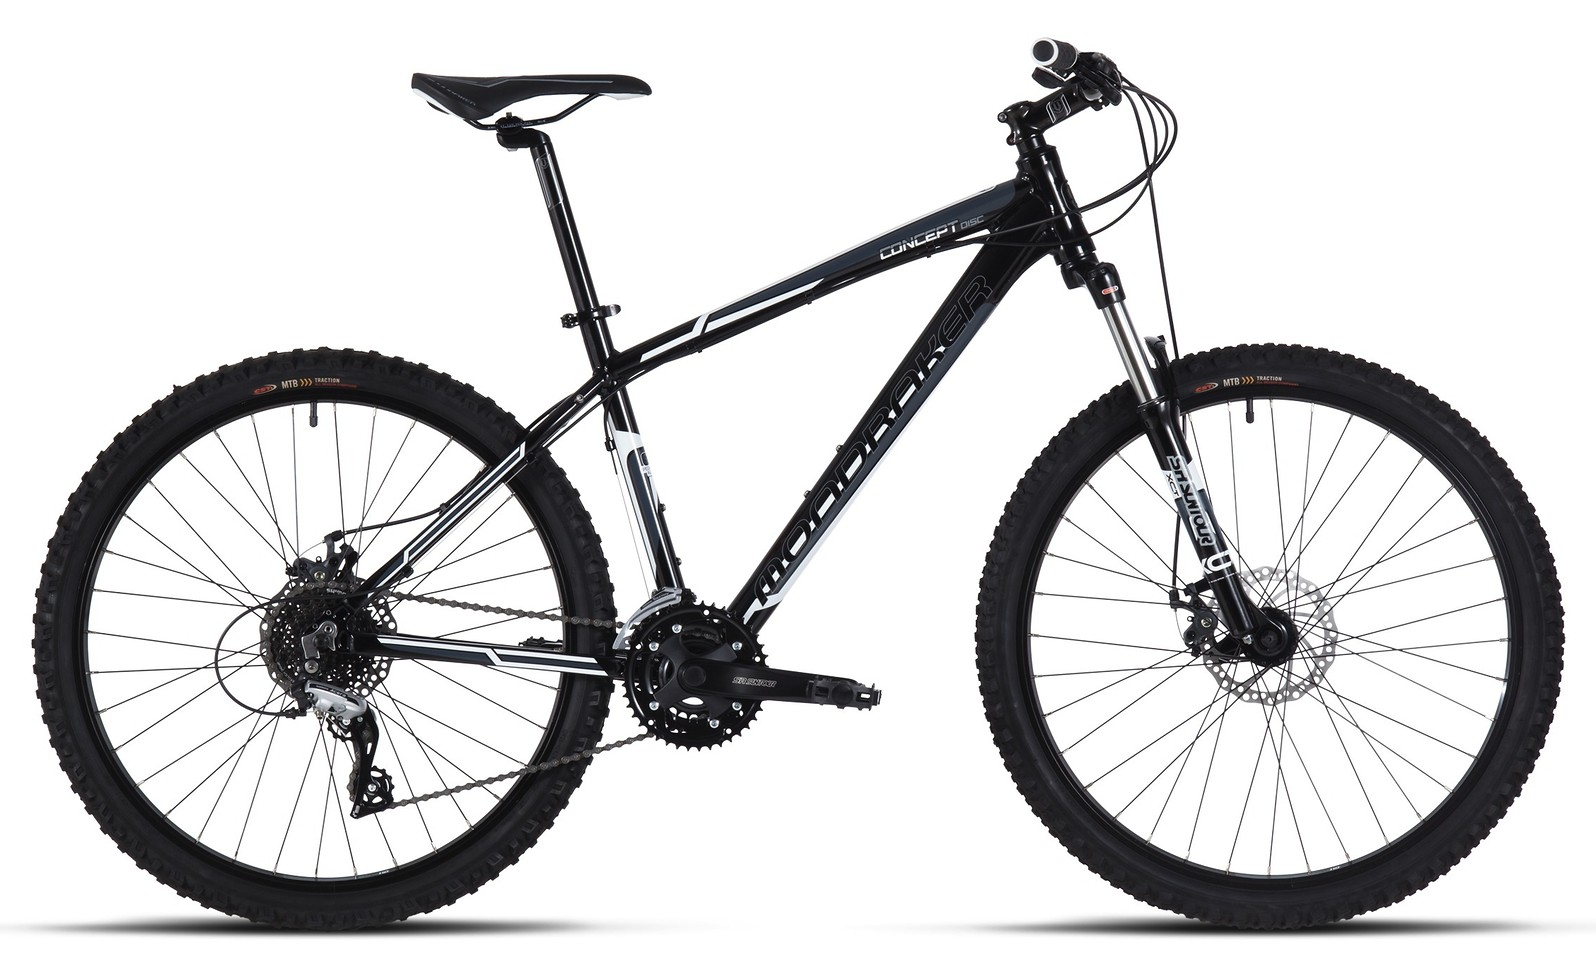 2013 Mondraker Concept Disc Bike bike - mondraker concept disc